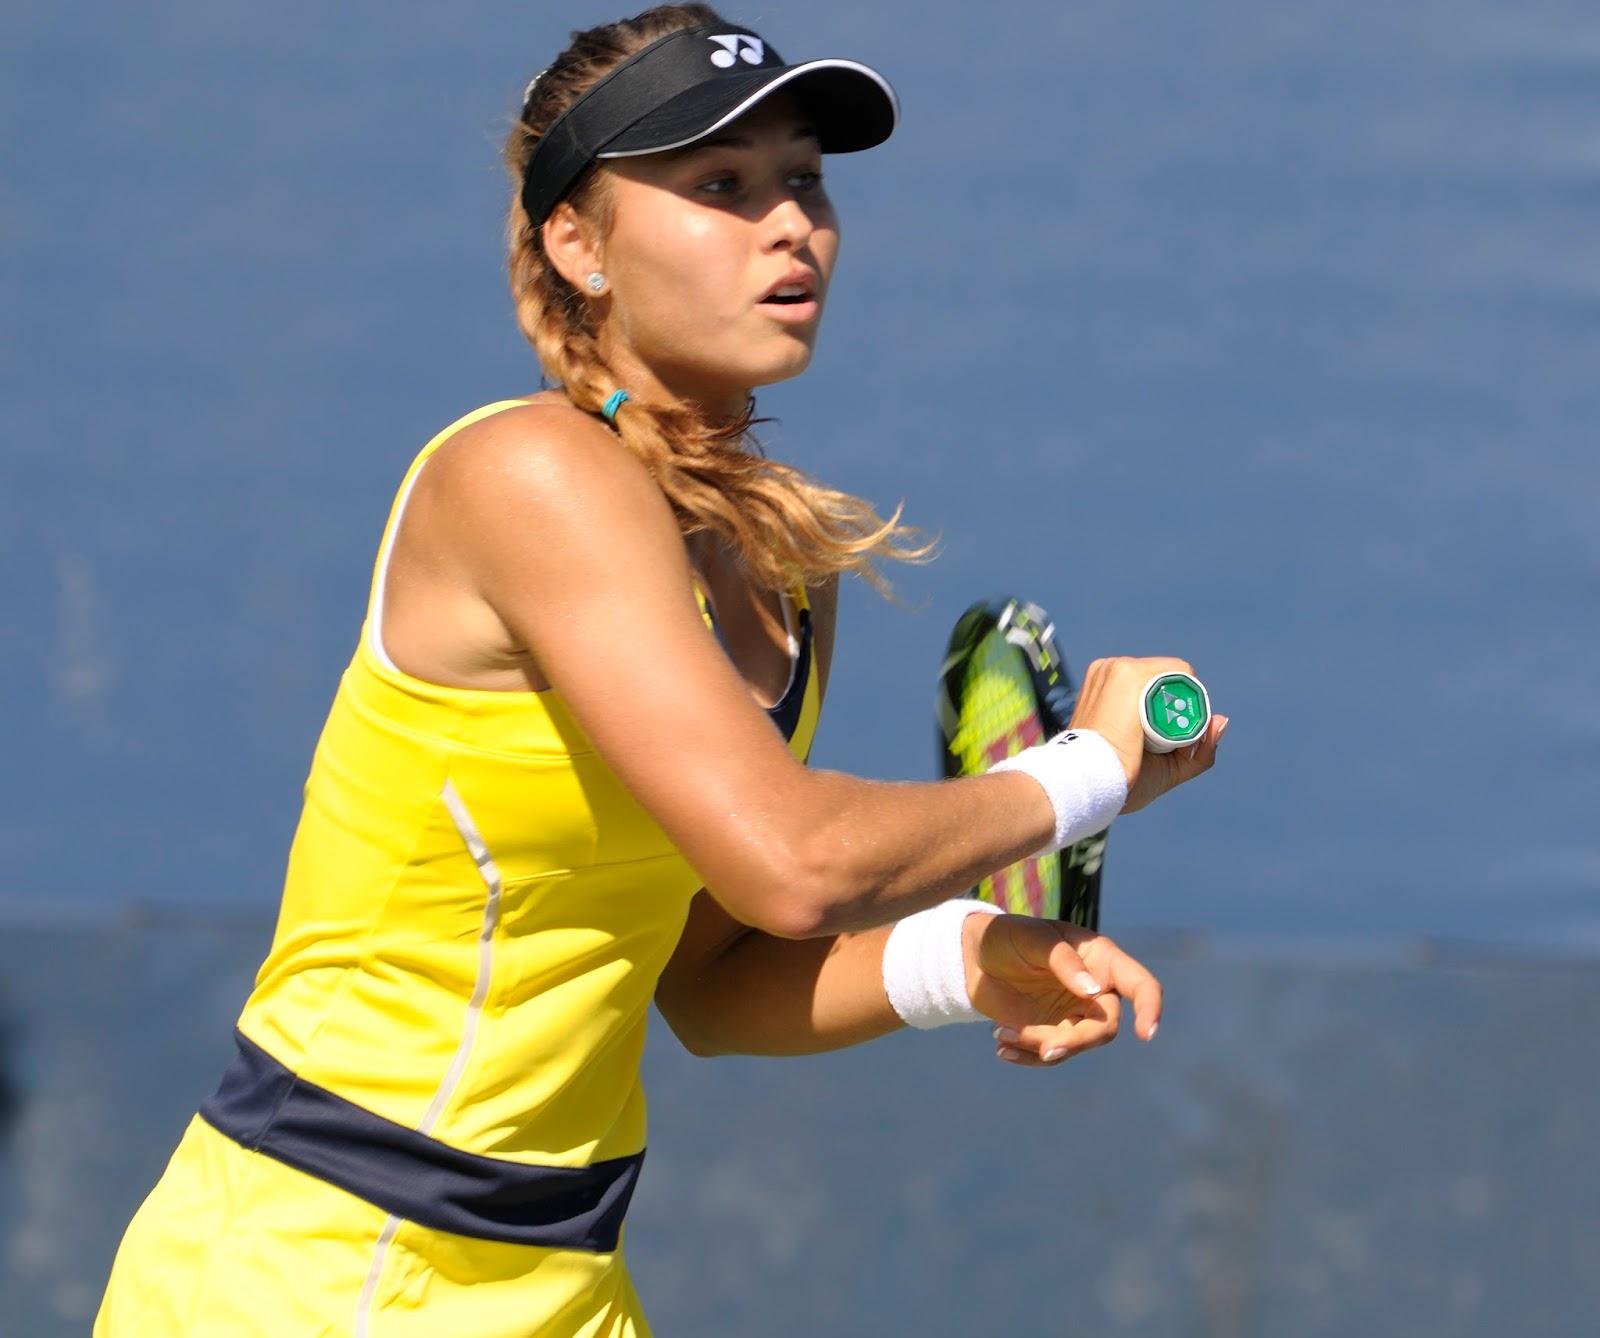 Agnieszka radwanska hot as hell at practice - 2 4